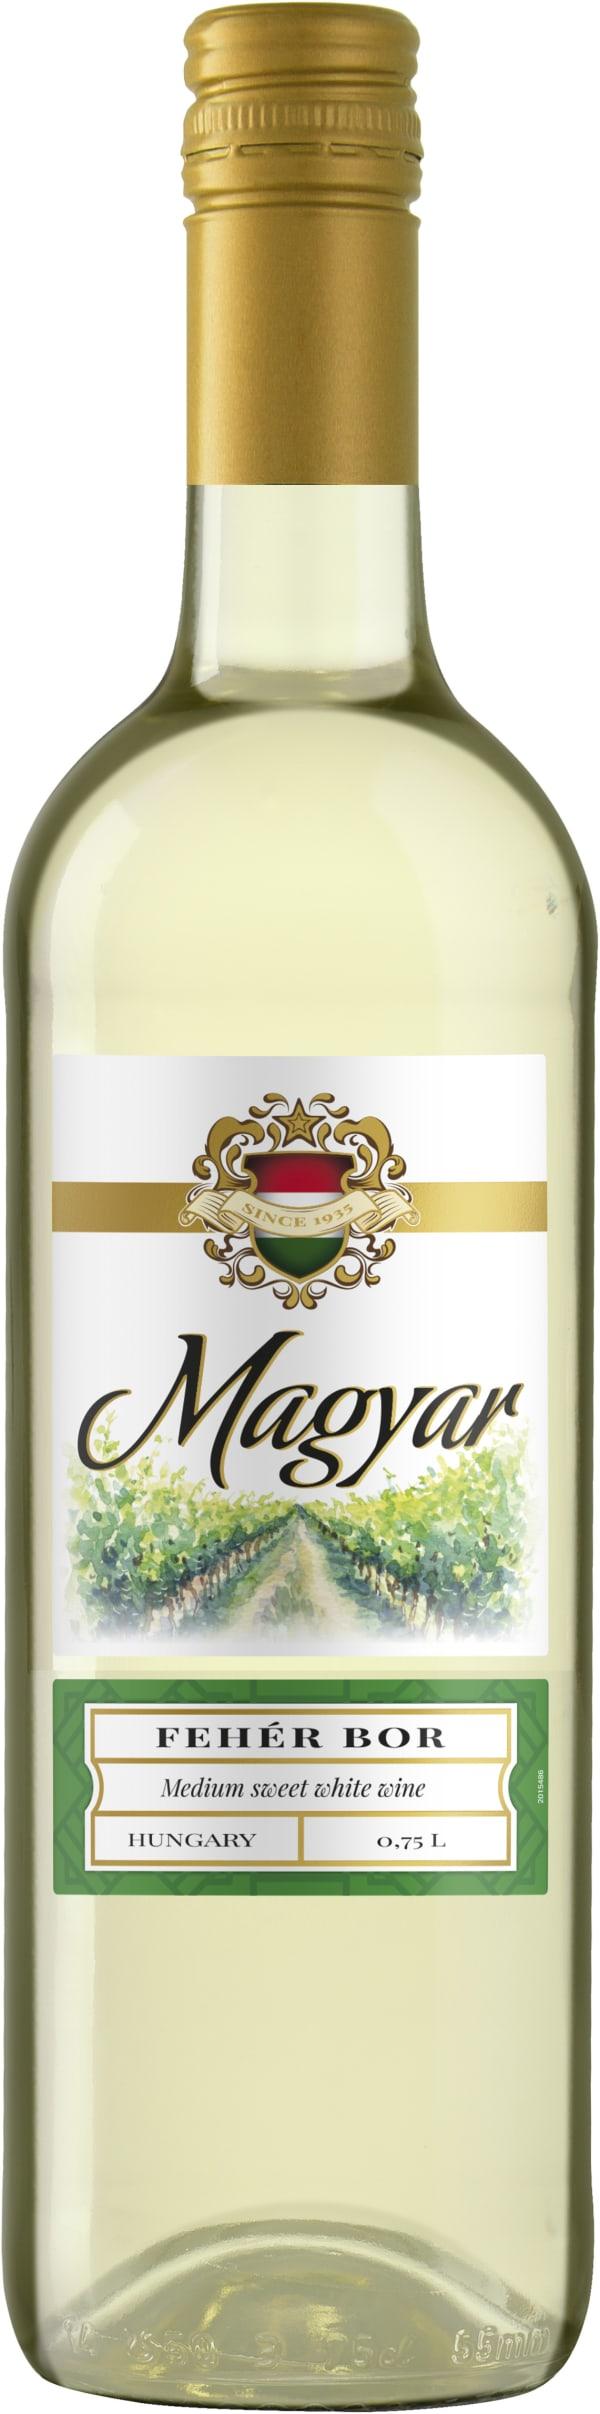 Magyar Fehér Bor